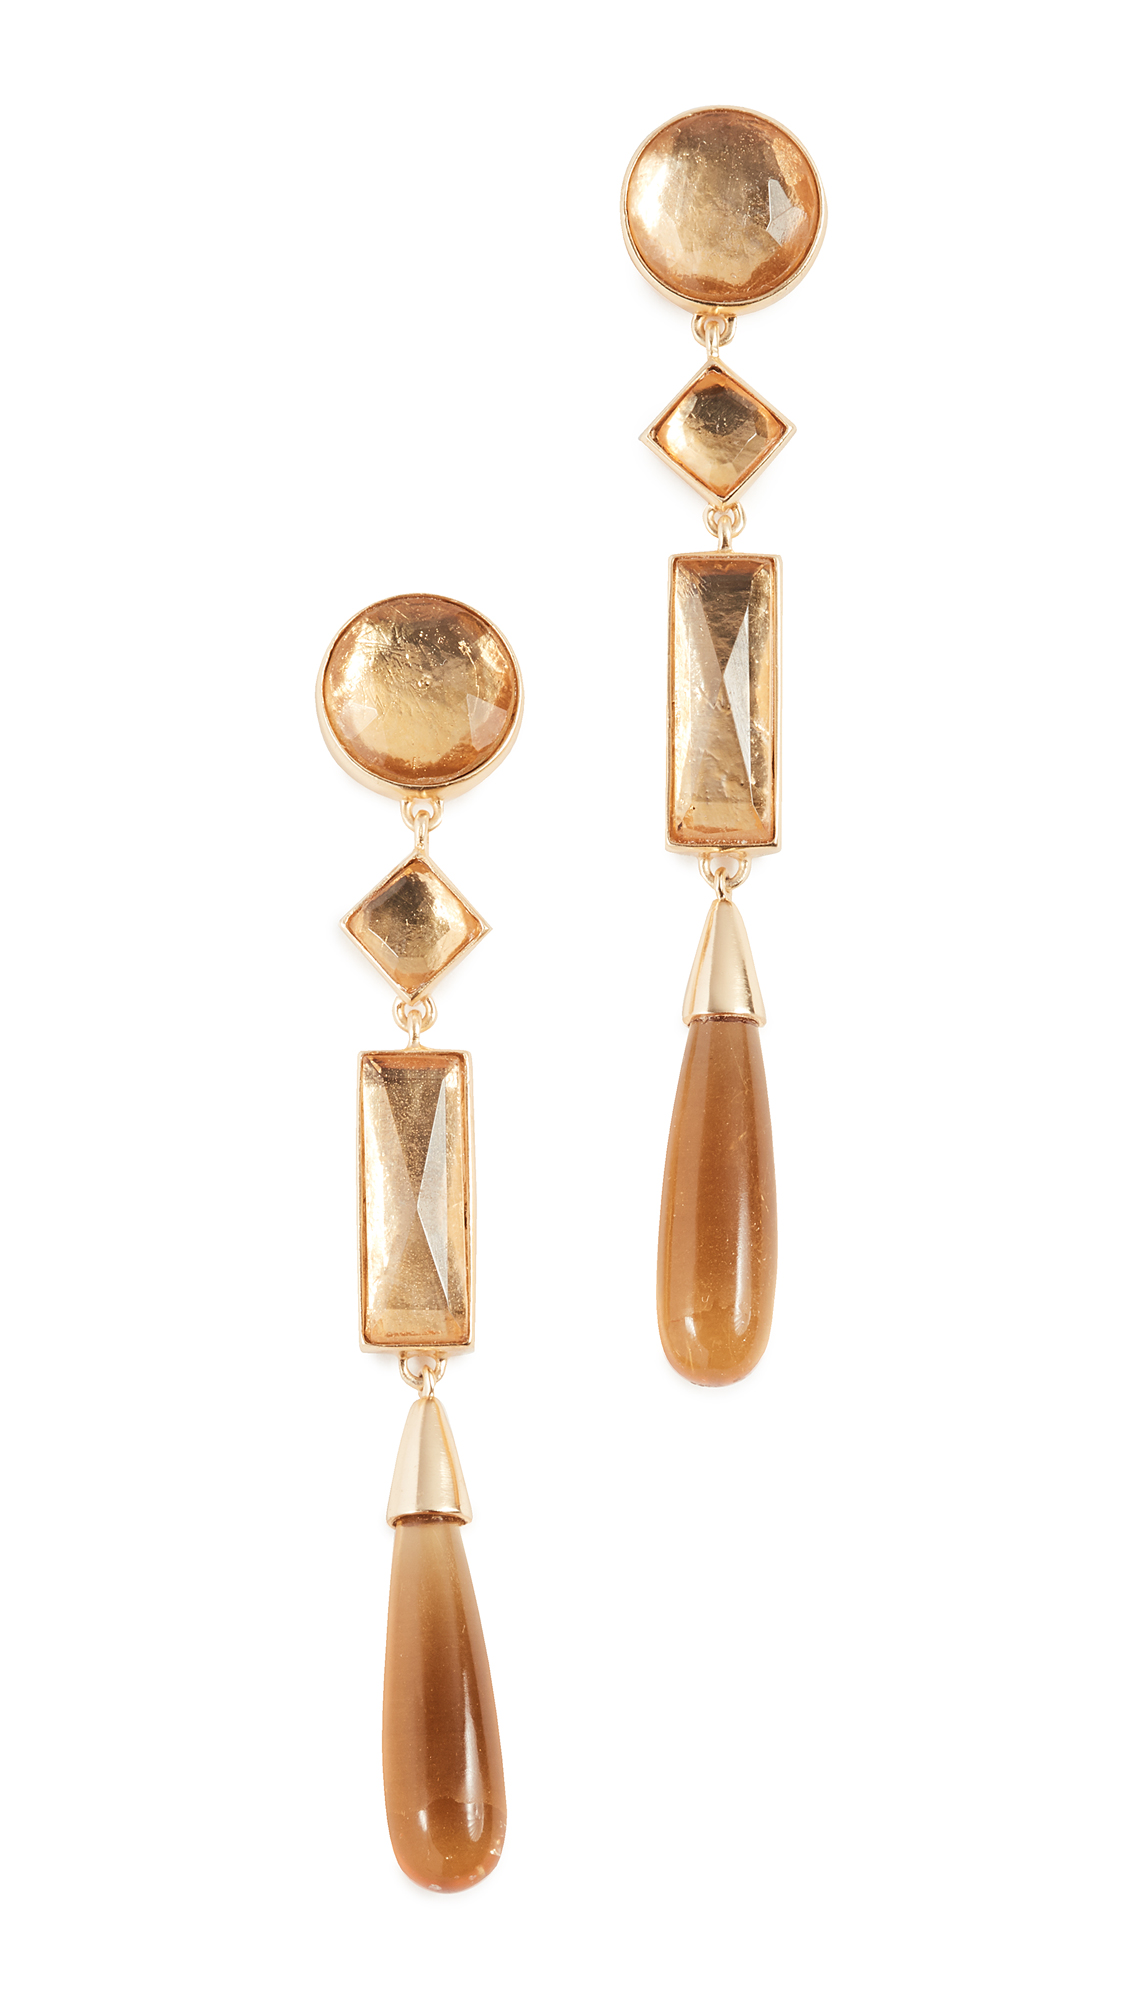 Tory Burch Embellished Linear Earrings - Light Topaz/Tory Gold